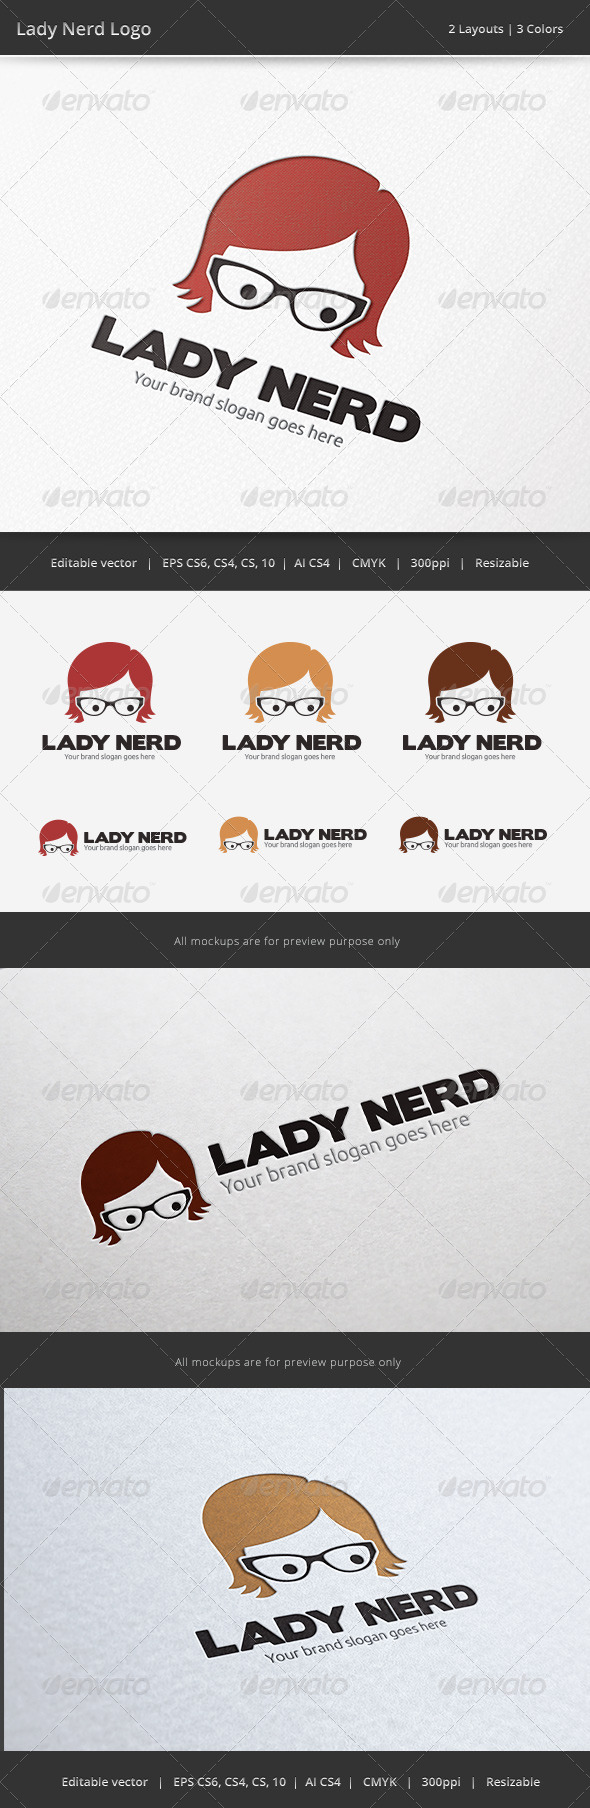 GraphicRiver Lady Nerd Logo 6562188